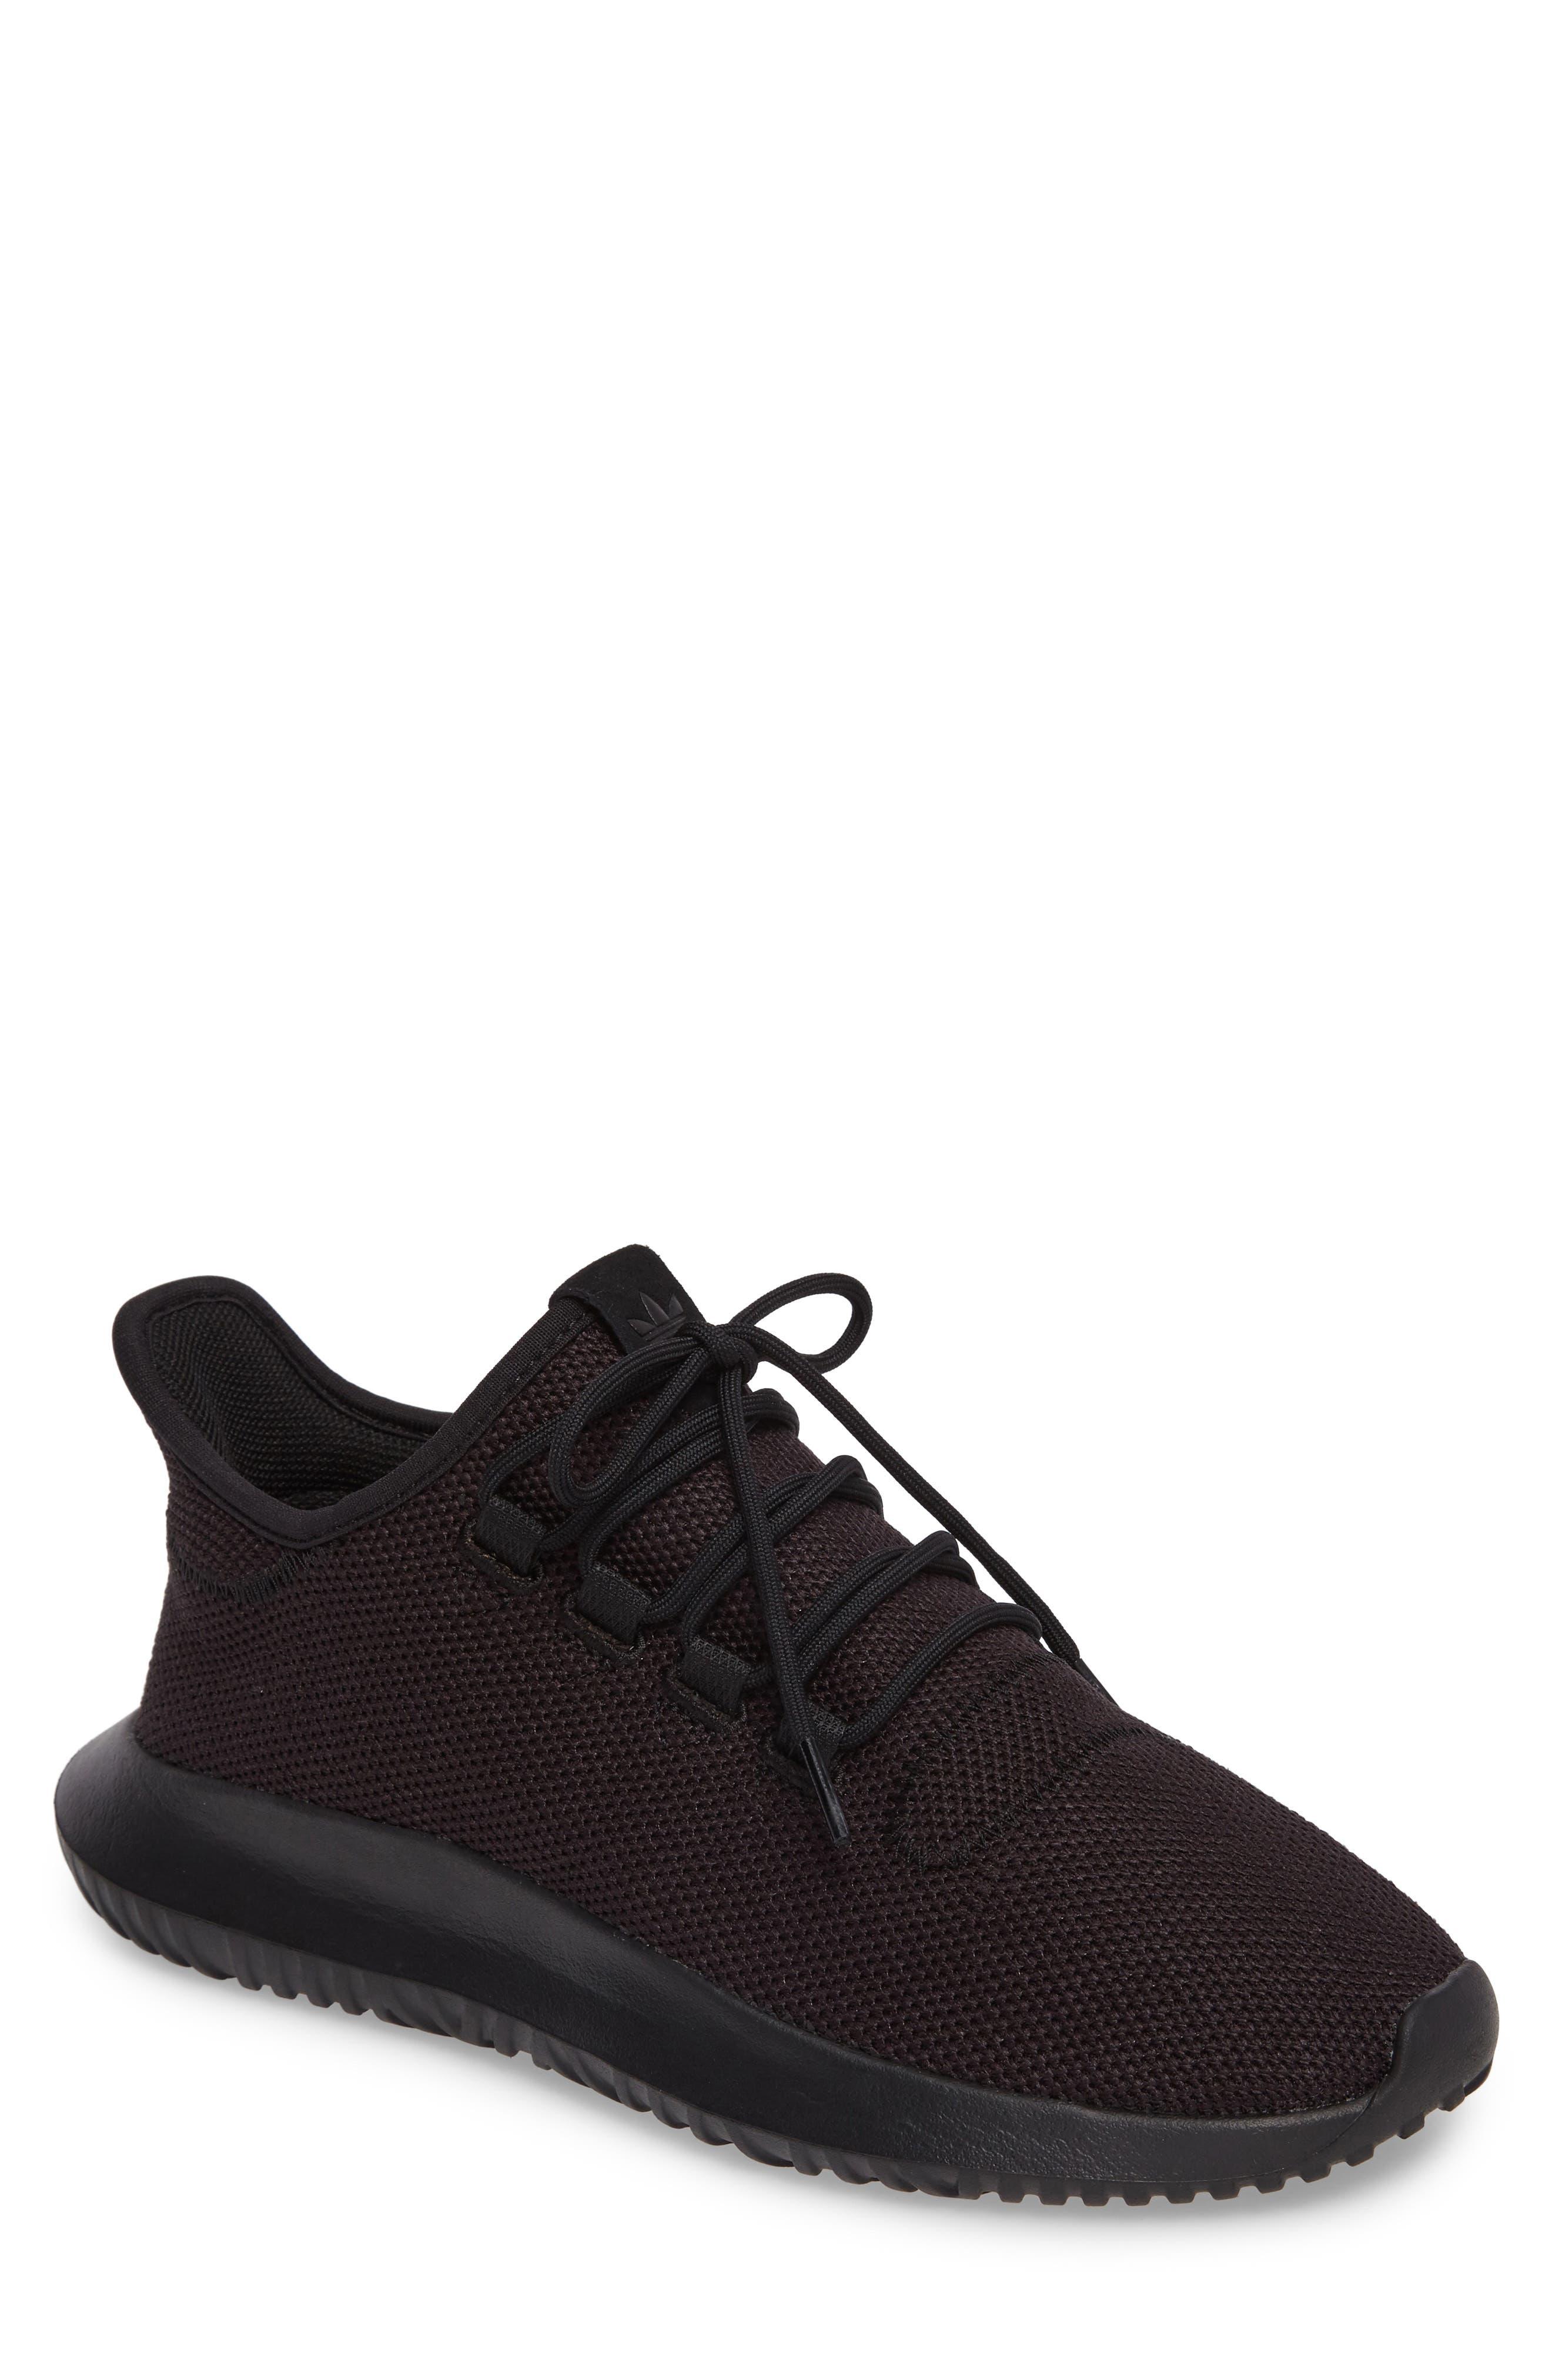 Tubular Shadow Sneaker,                         Main,                         color, Core Black/ White/ Core Black